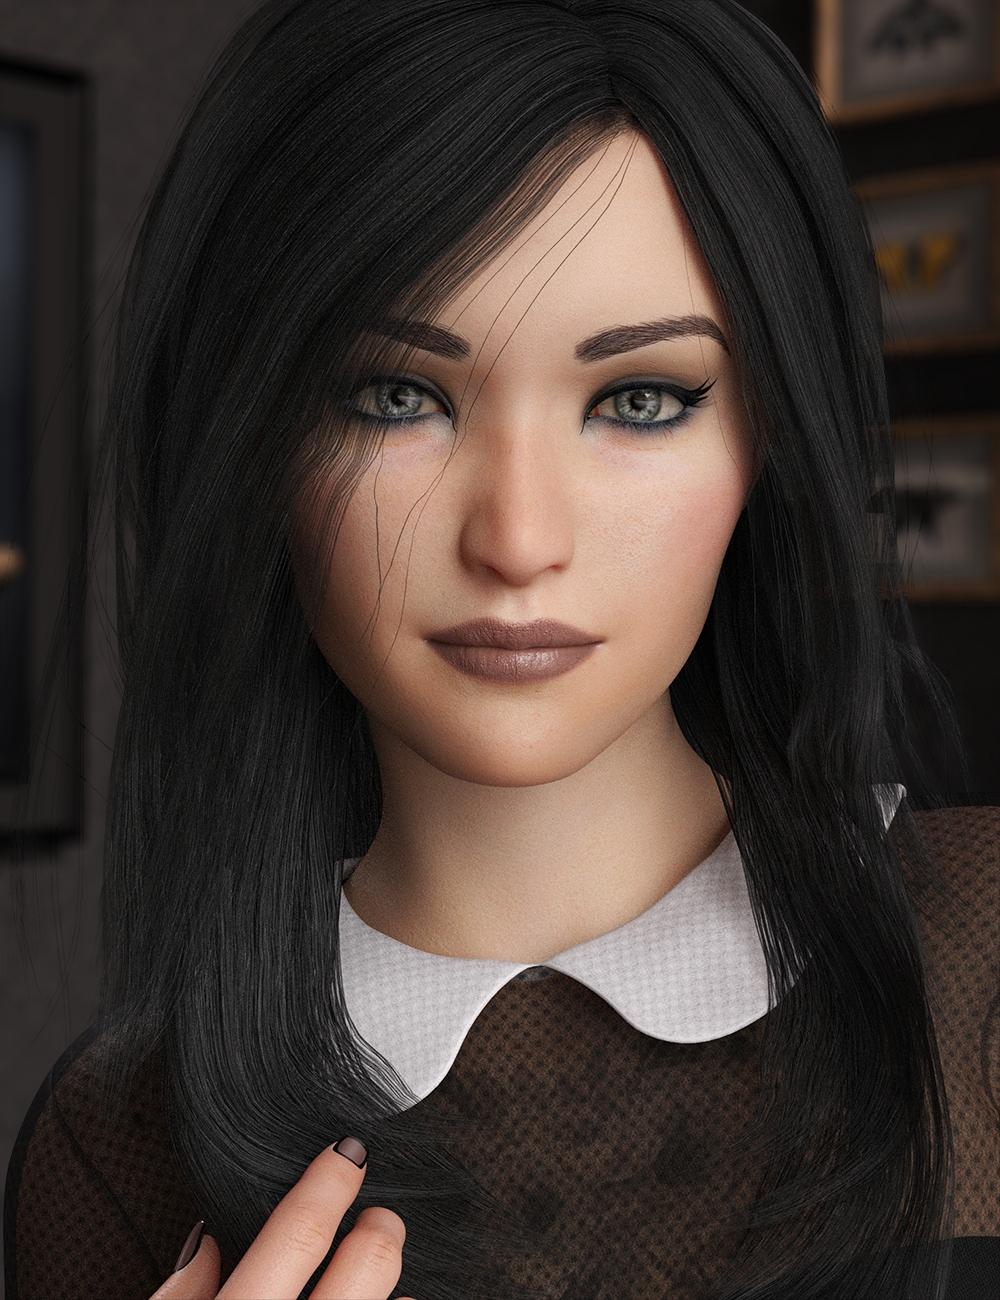 LY Naryssa HD for Genesis 8 Female by: Lyoness, 3D Models by Daz 3D